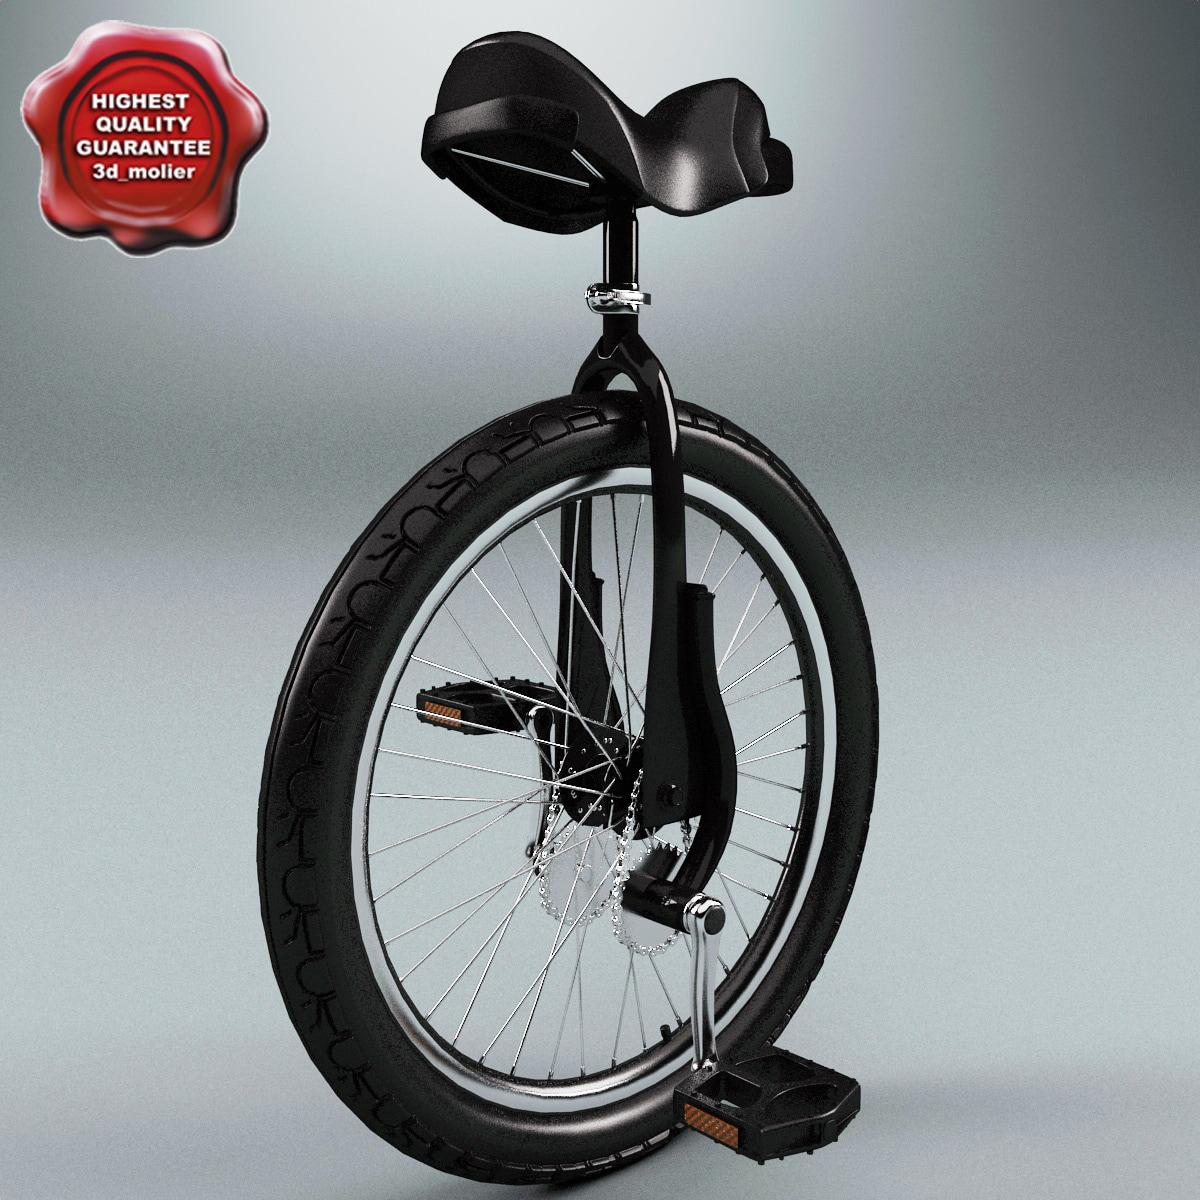 Unicycle_Huni-Rex_00.jpg